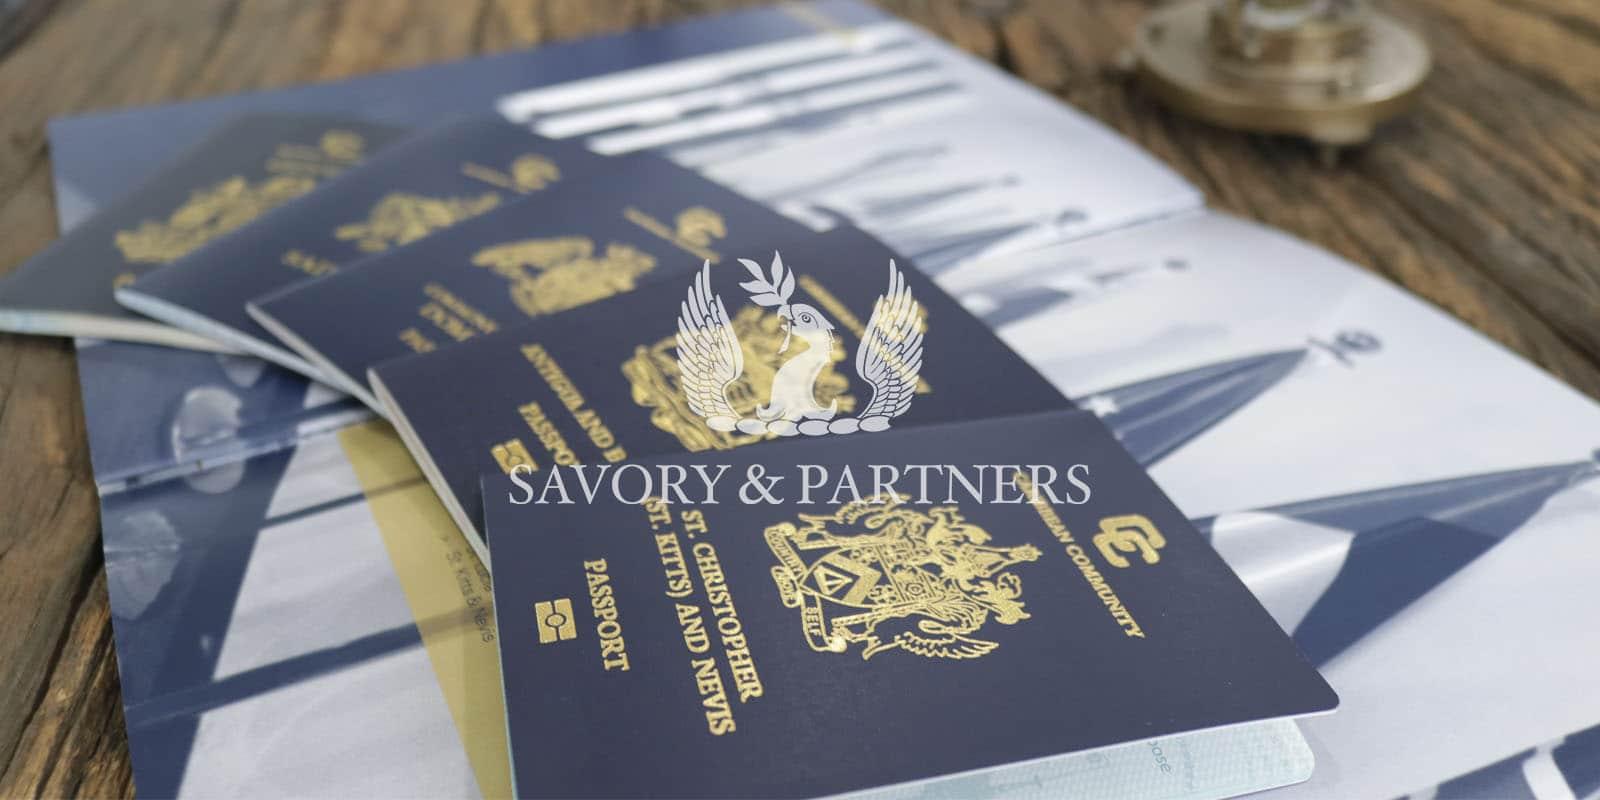 Caribbean passports at Savory & Partners office in Dubai